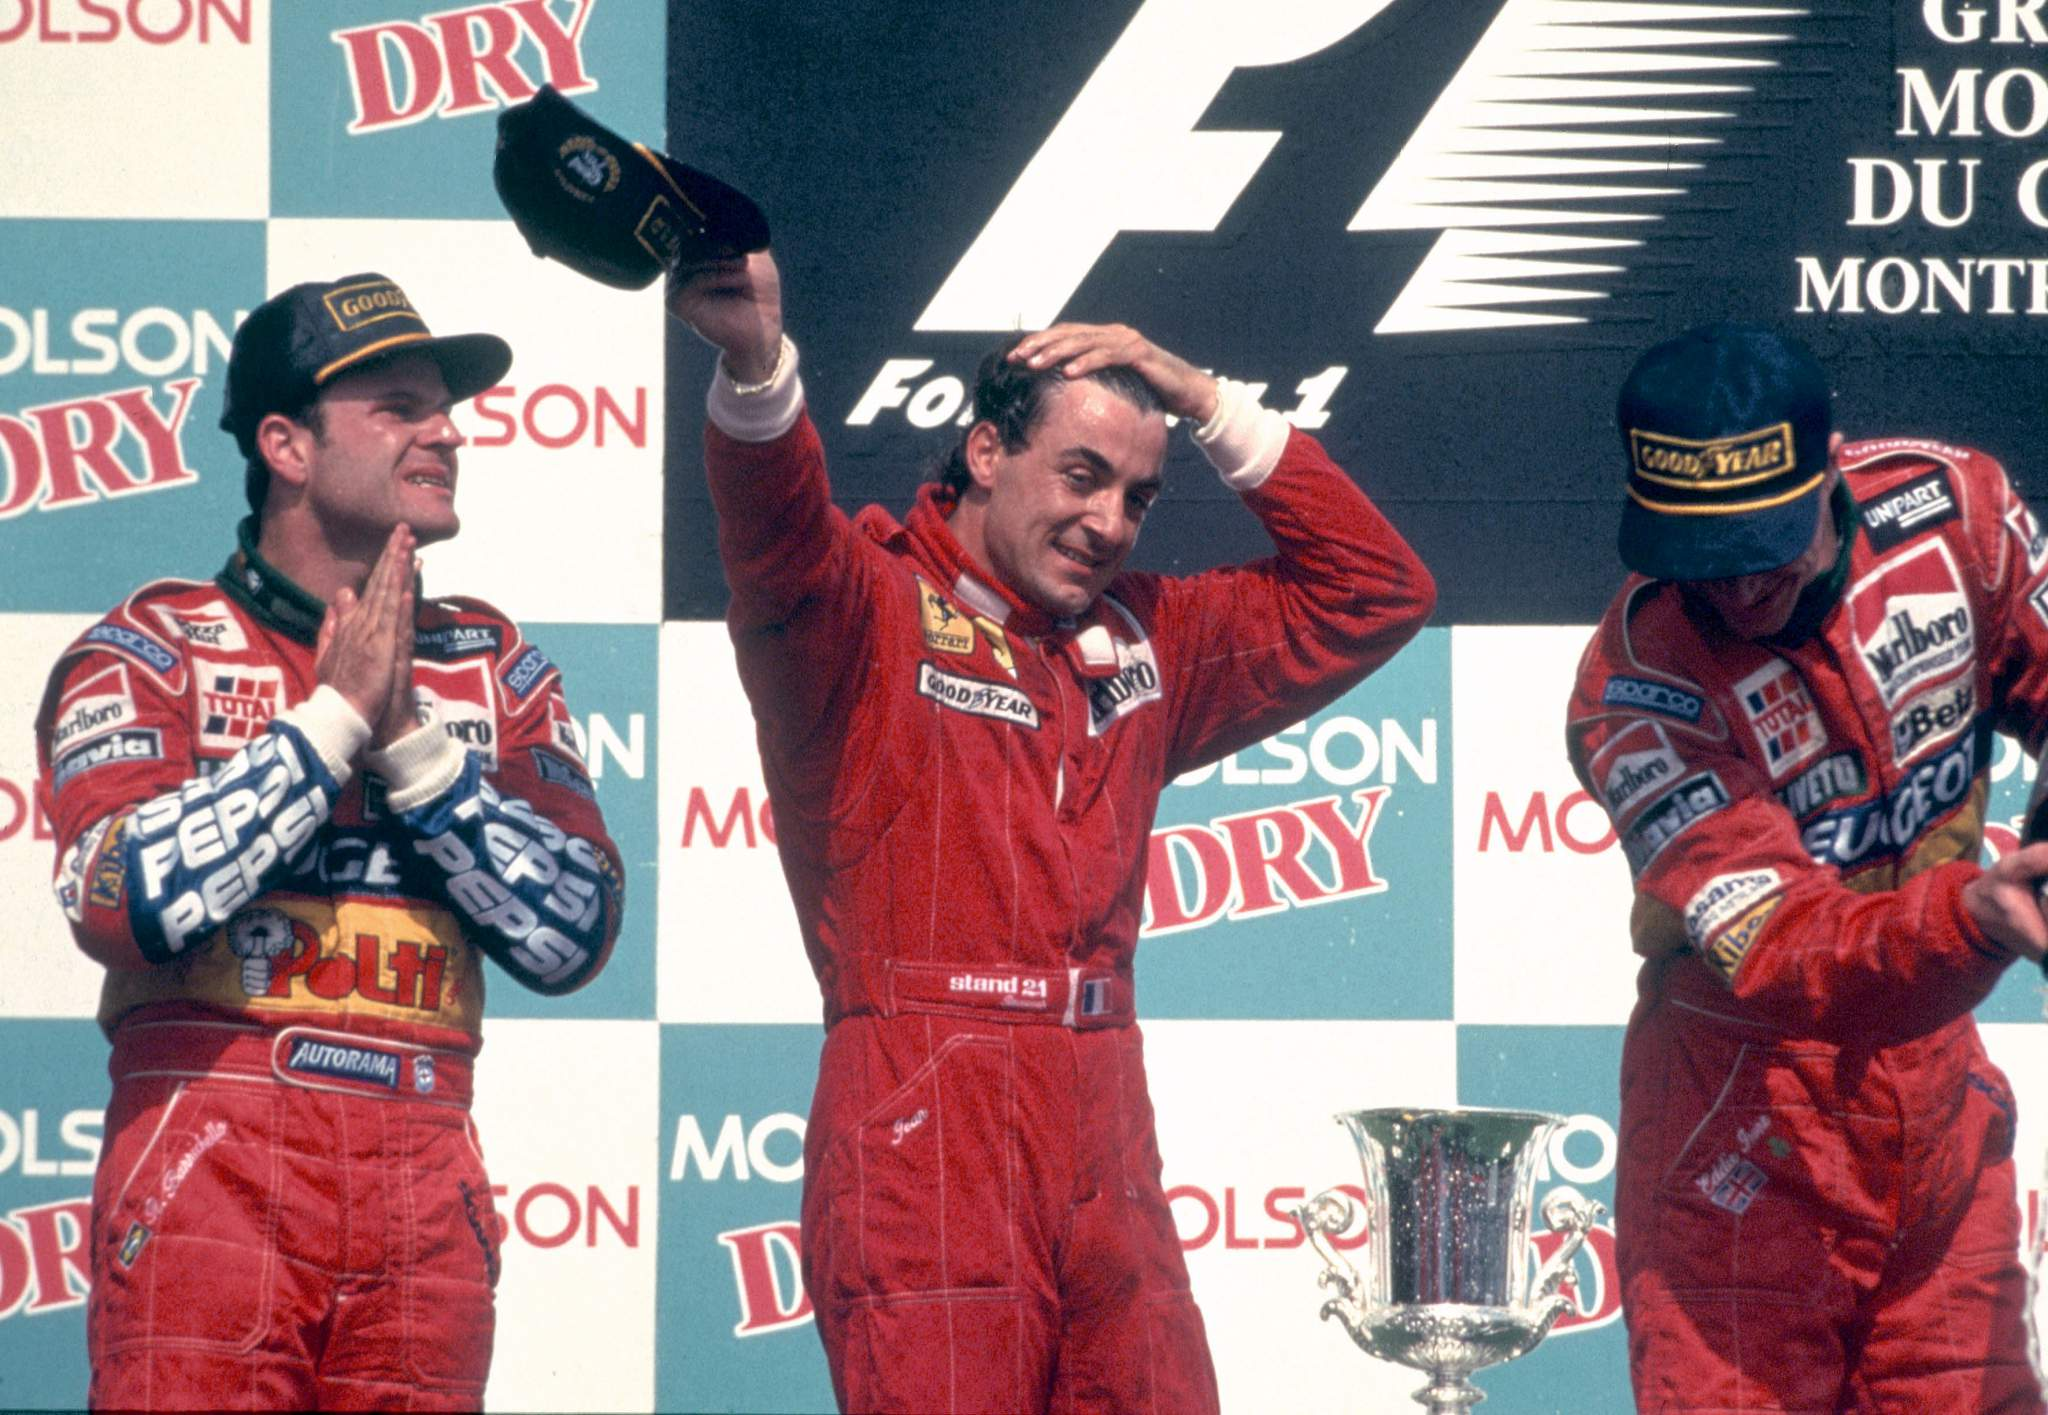 Canadian Grand Prix Montreal (cdn) 09 11 06 1995